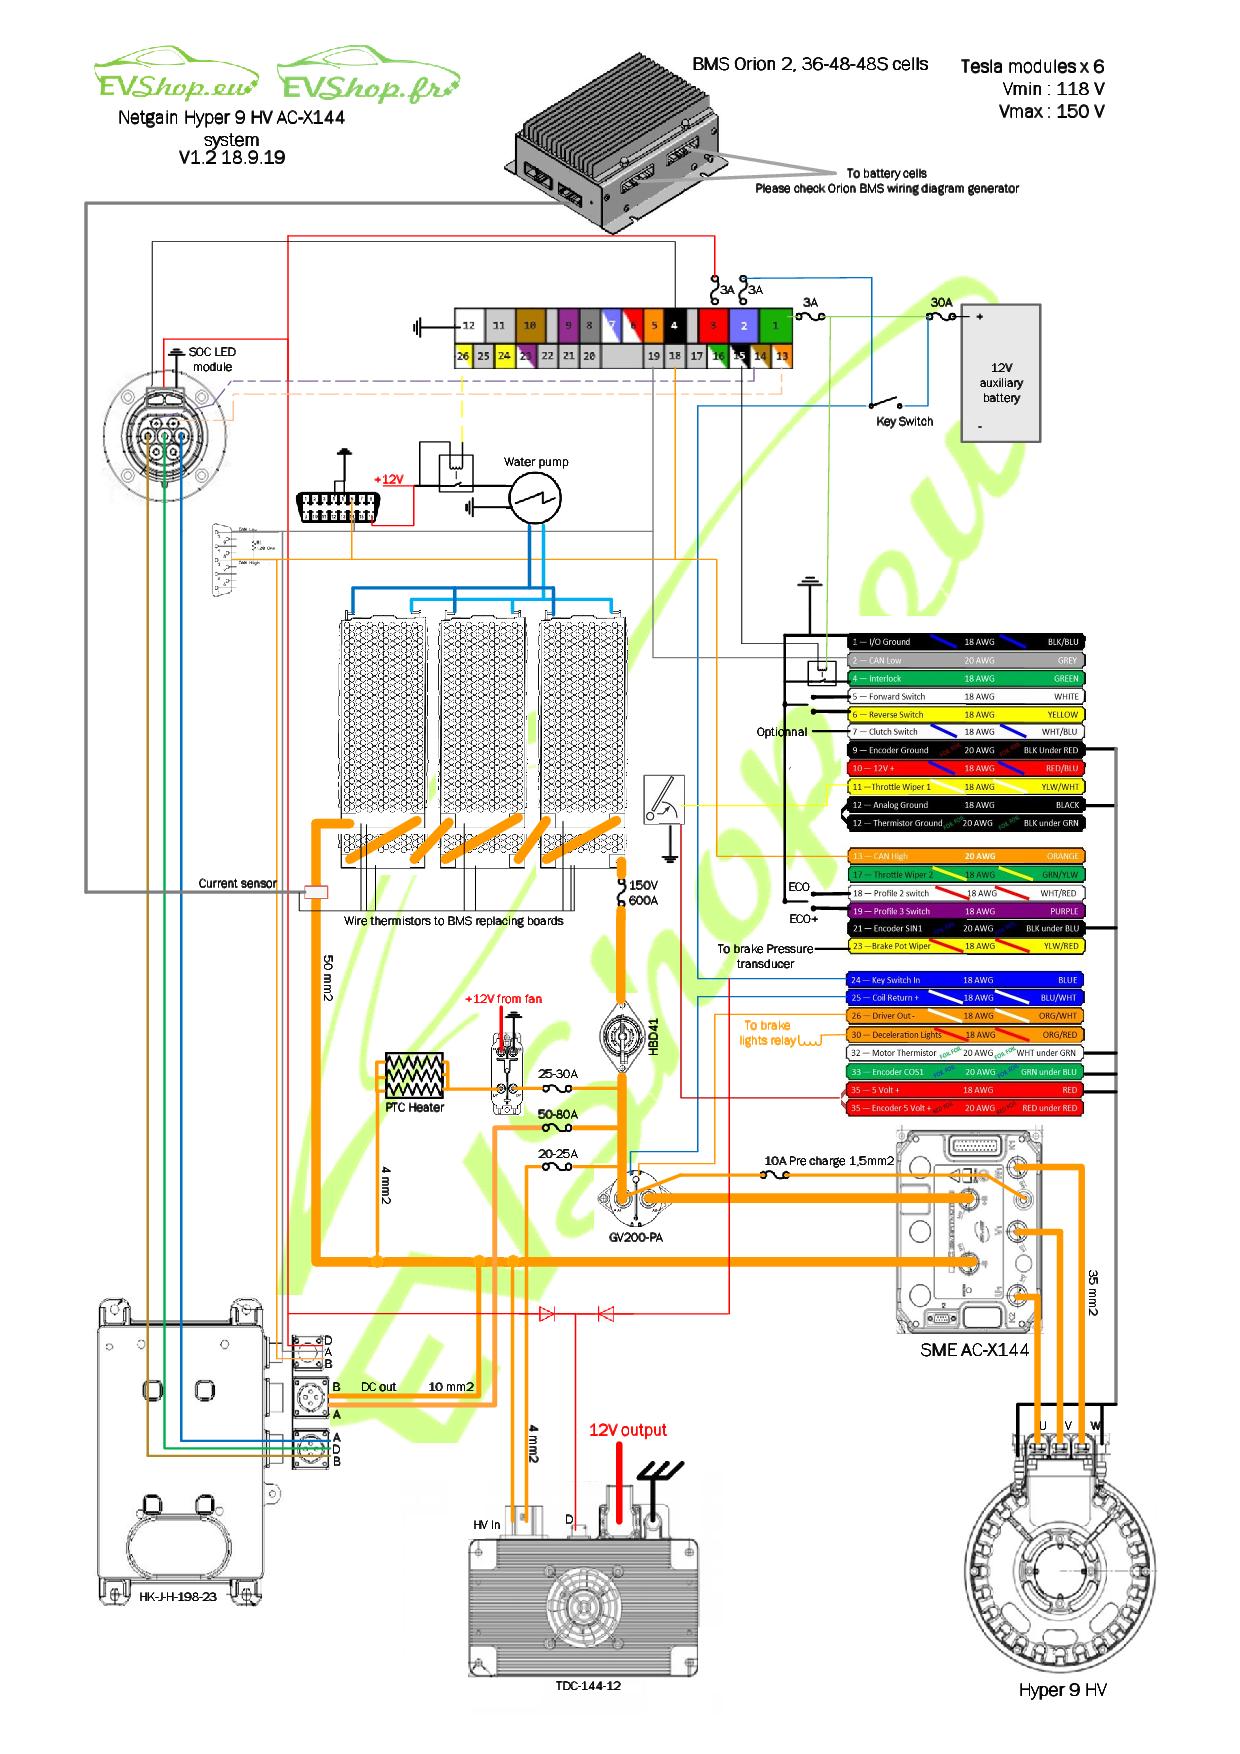 Visio-Hyper 9 HV V2-02_1.png